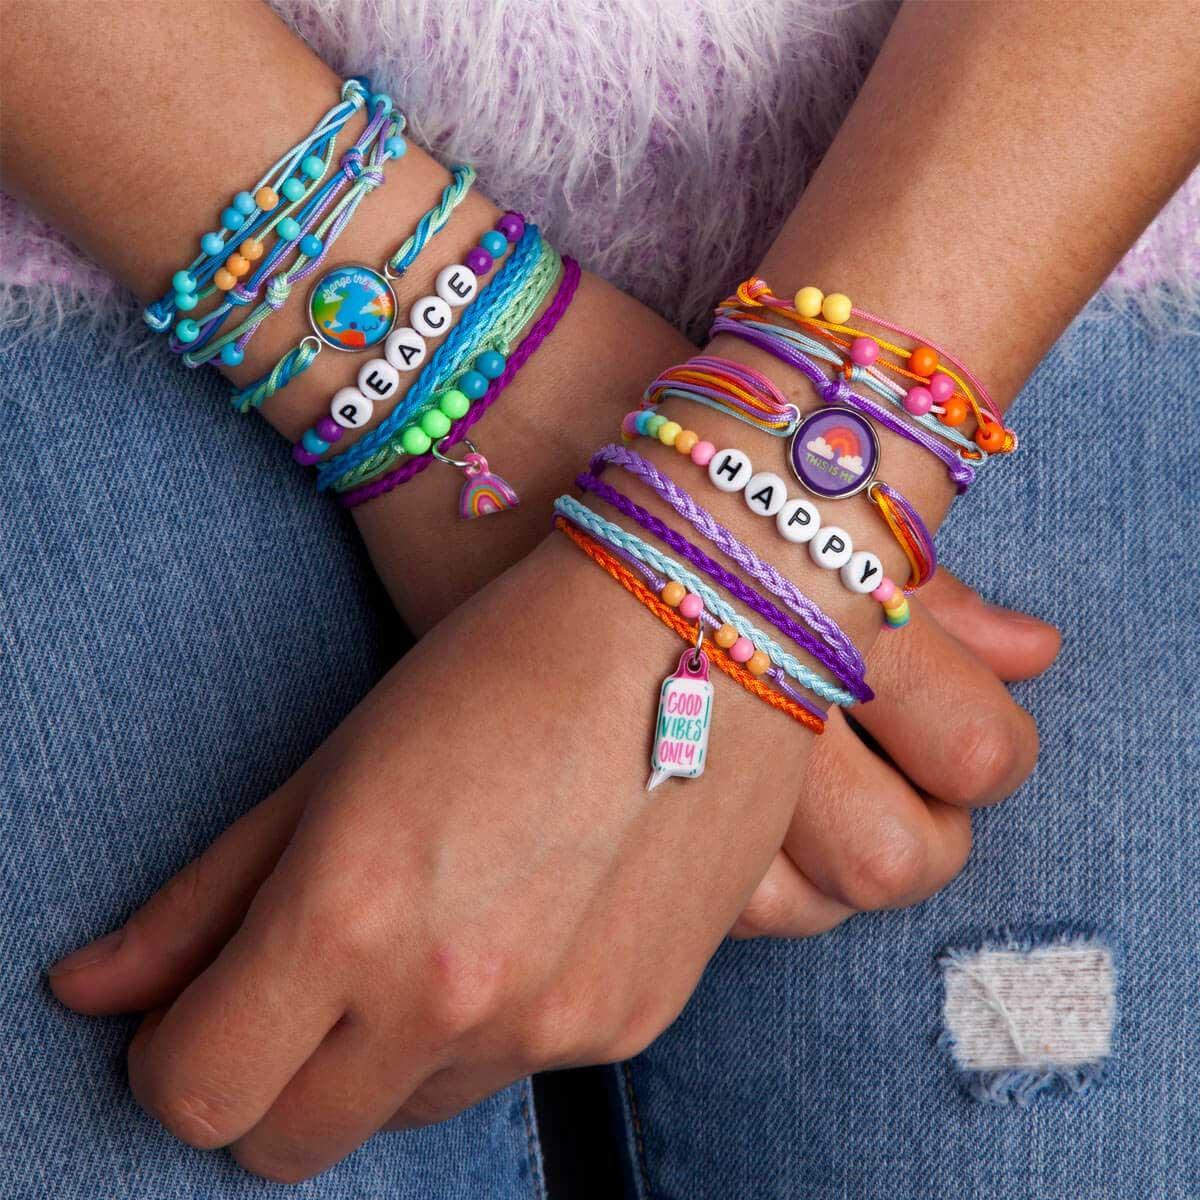 Craft-tastic All About Me Bracelet